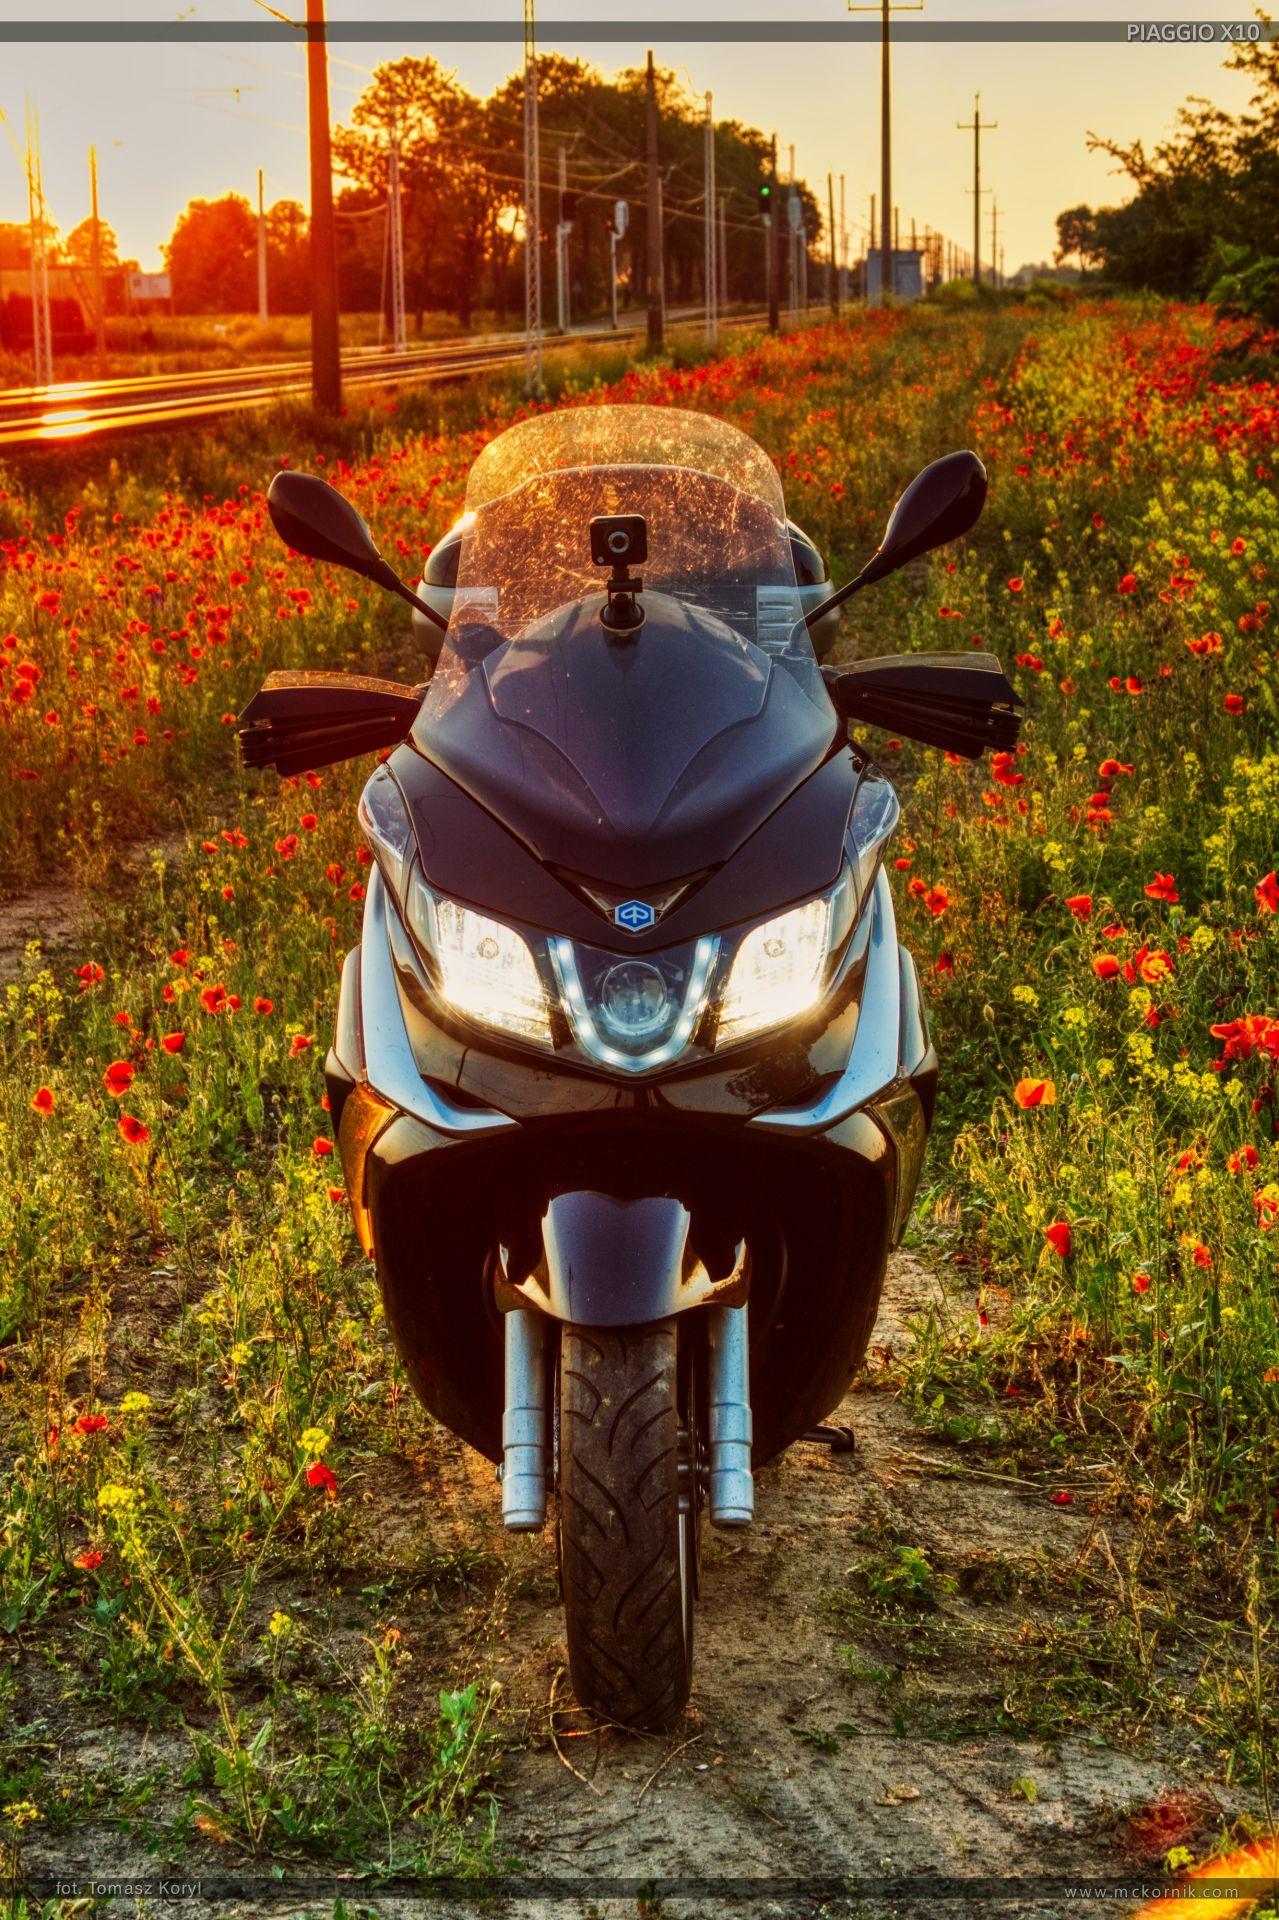 Sunset and Piaggio x10 350 motorcycle - mckornik.com